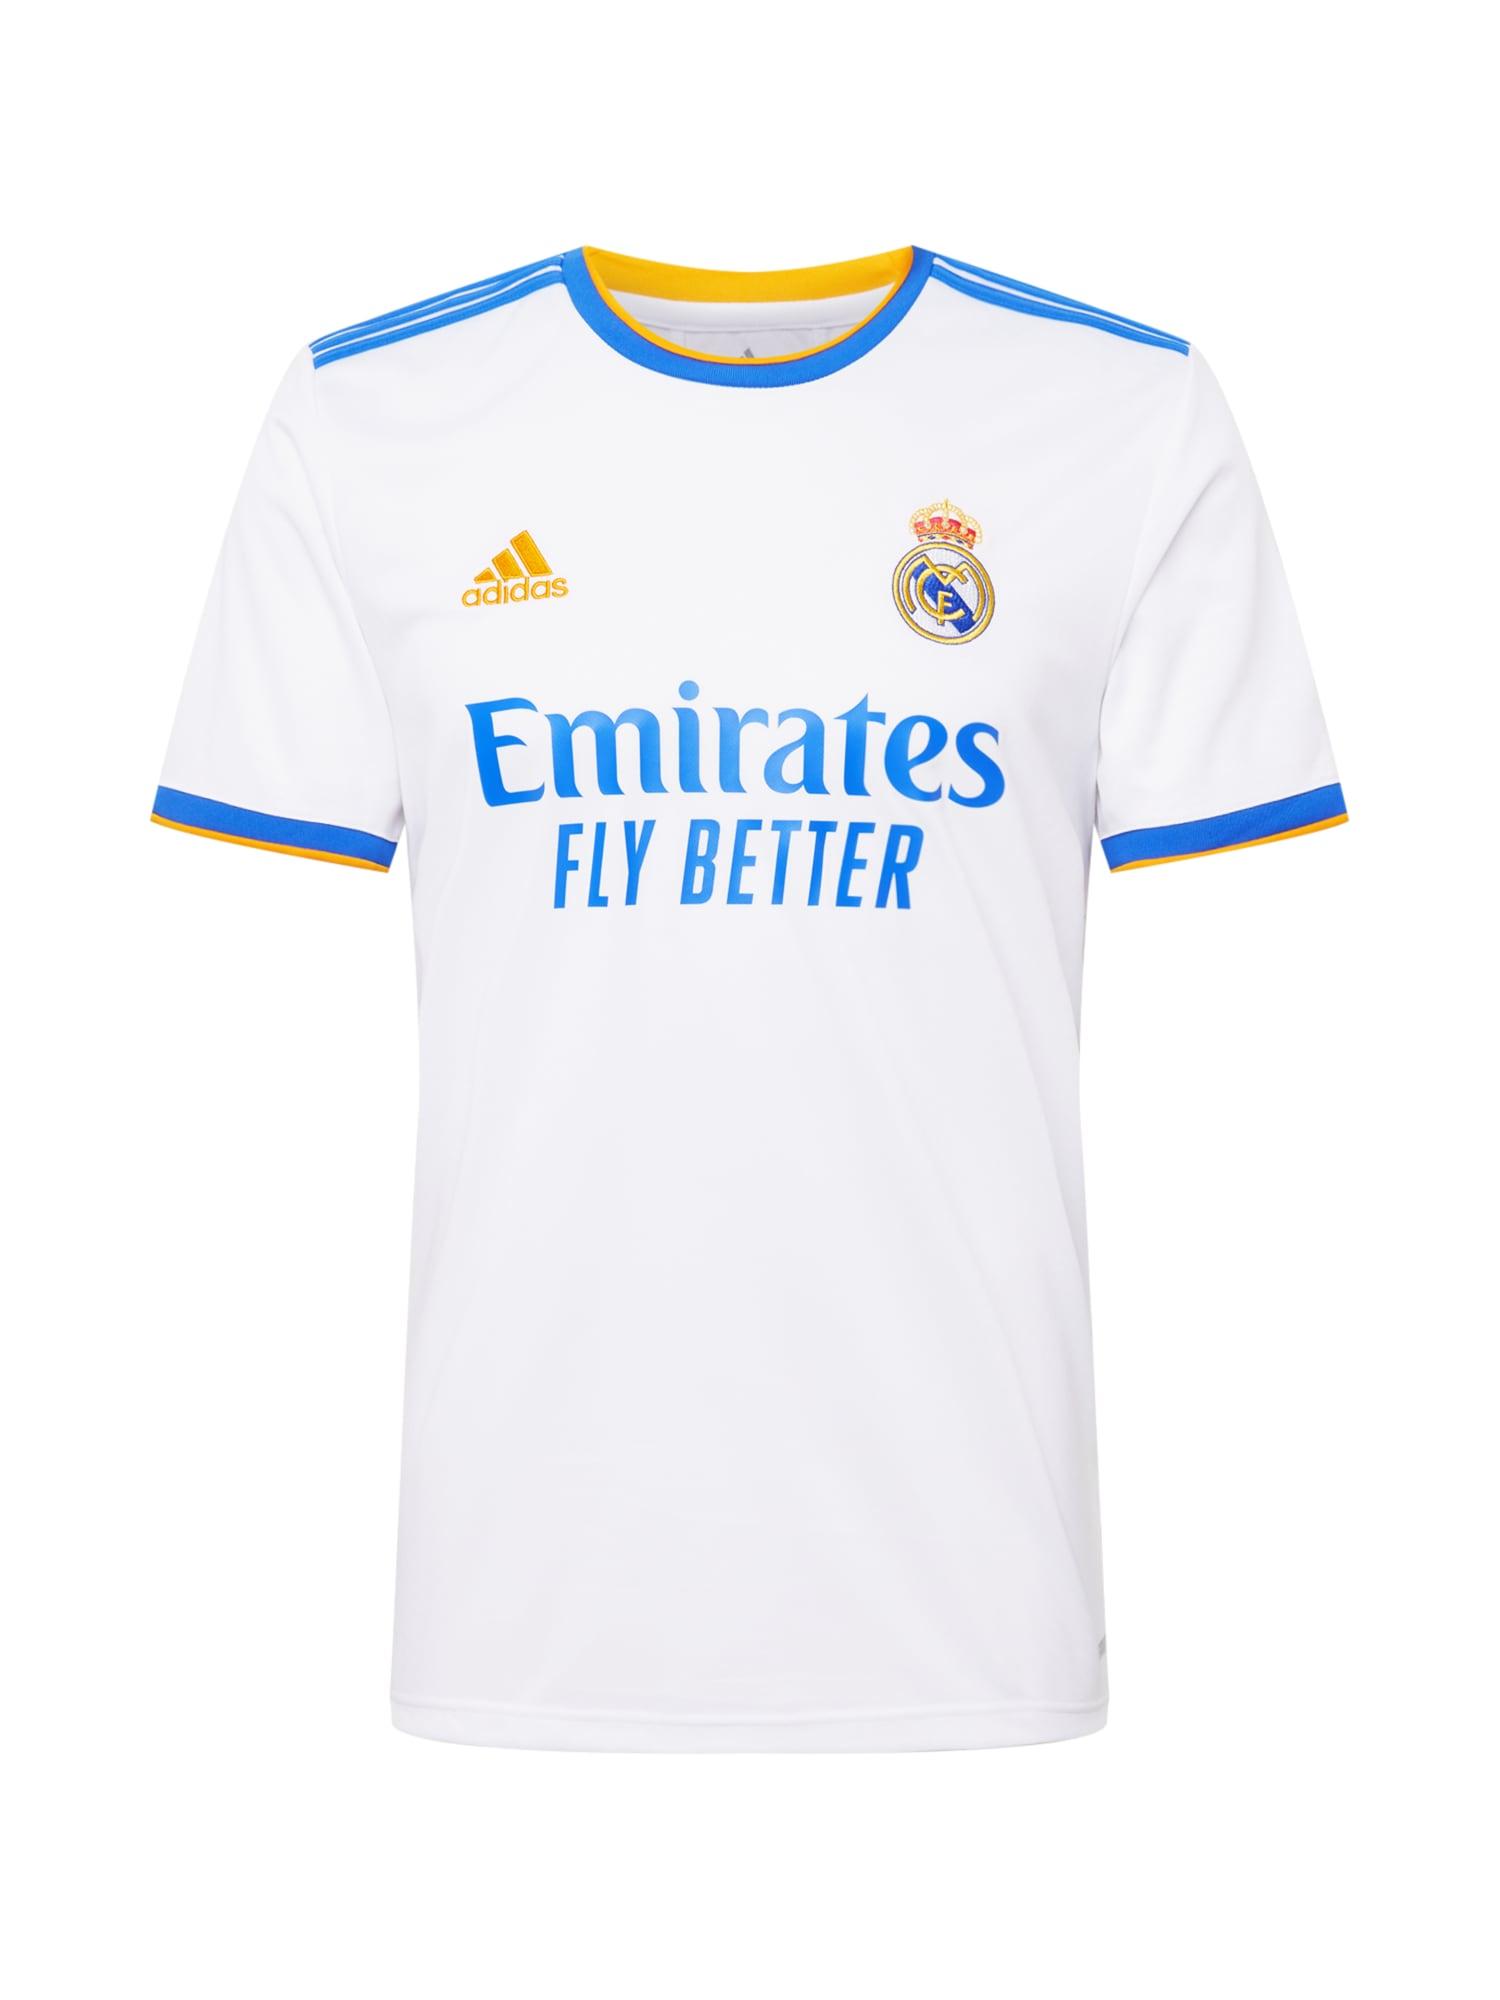 ADIDAS PERFORMANCE Camiseta de fútbol  Real Madrid  Blanco